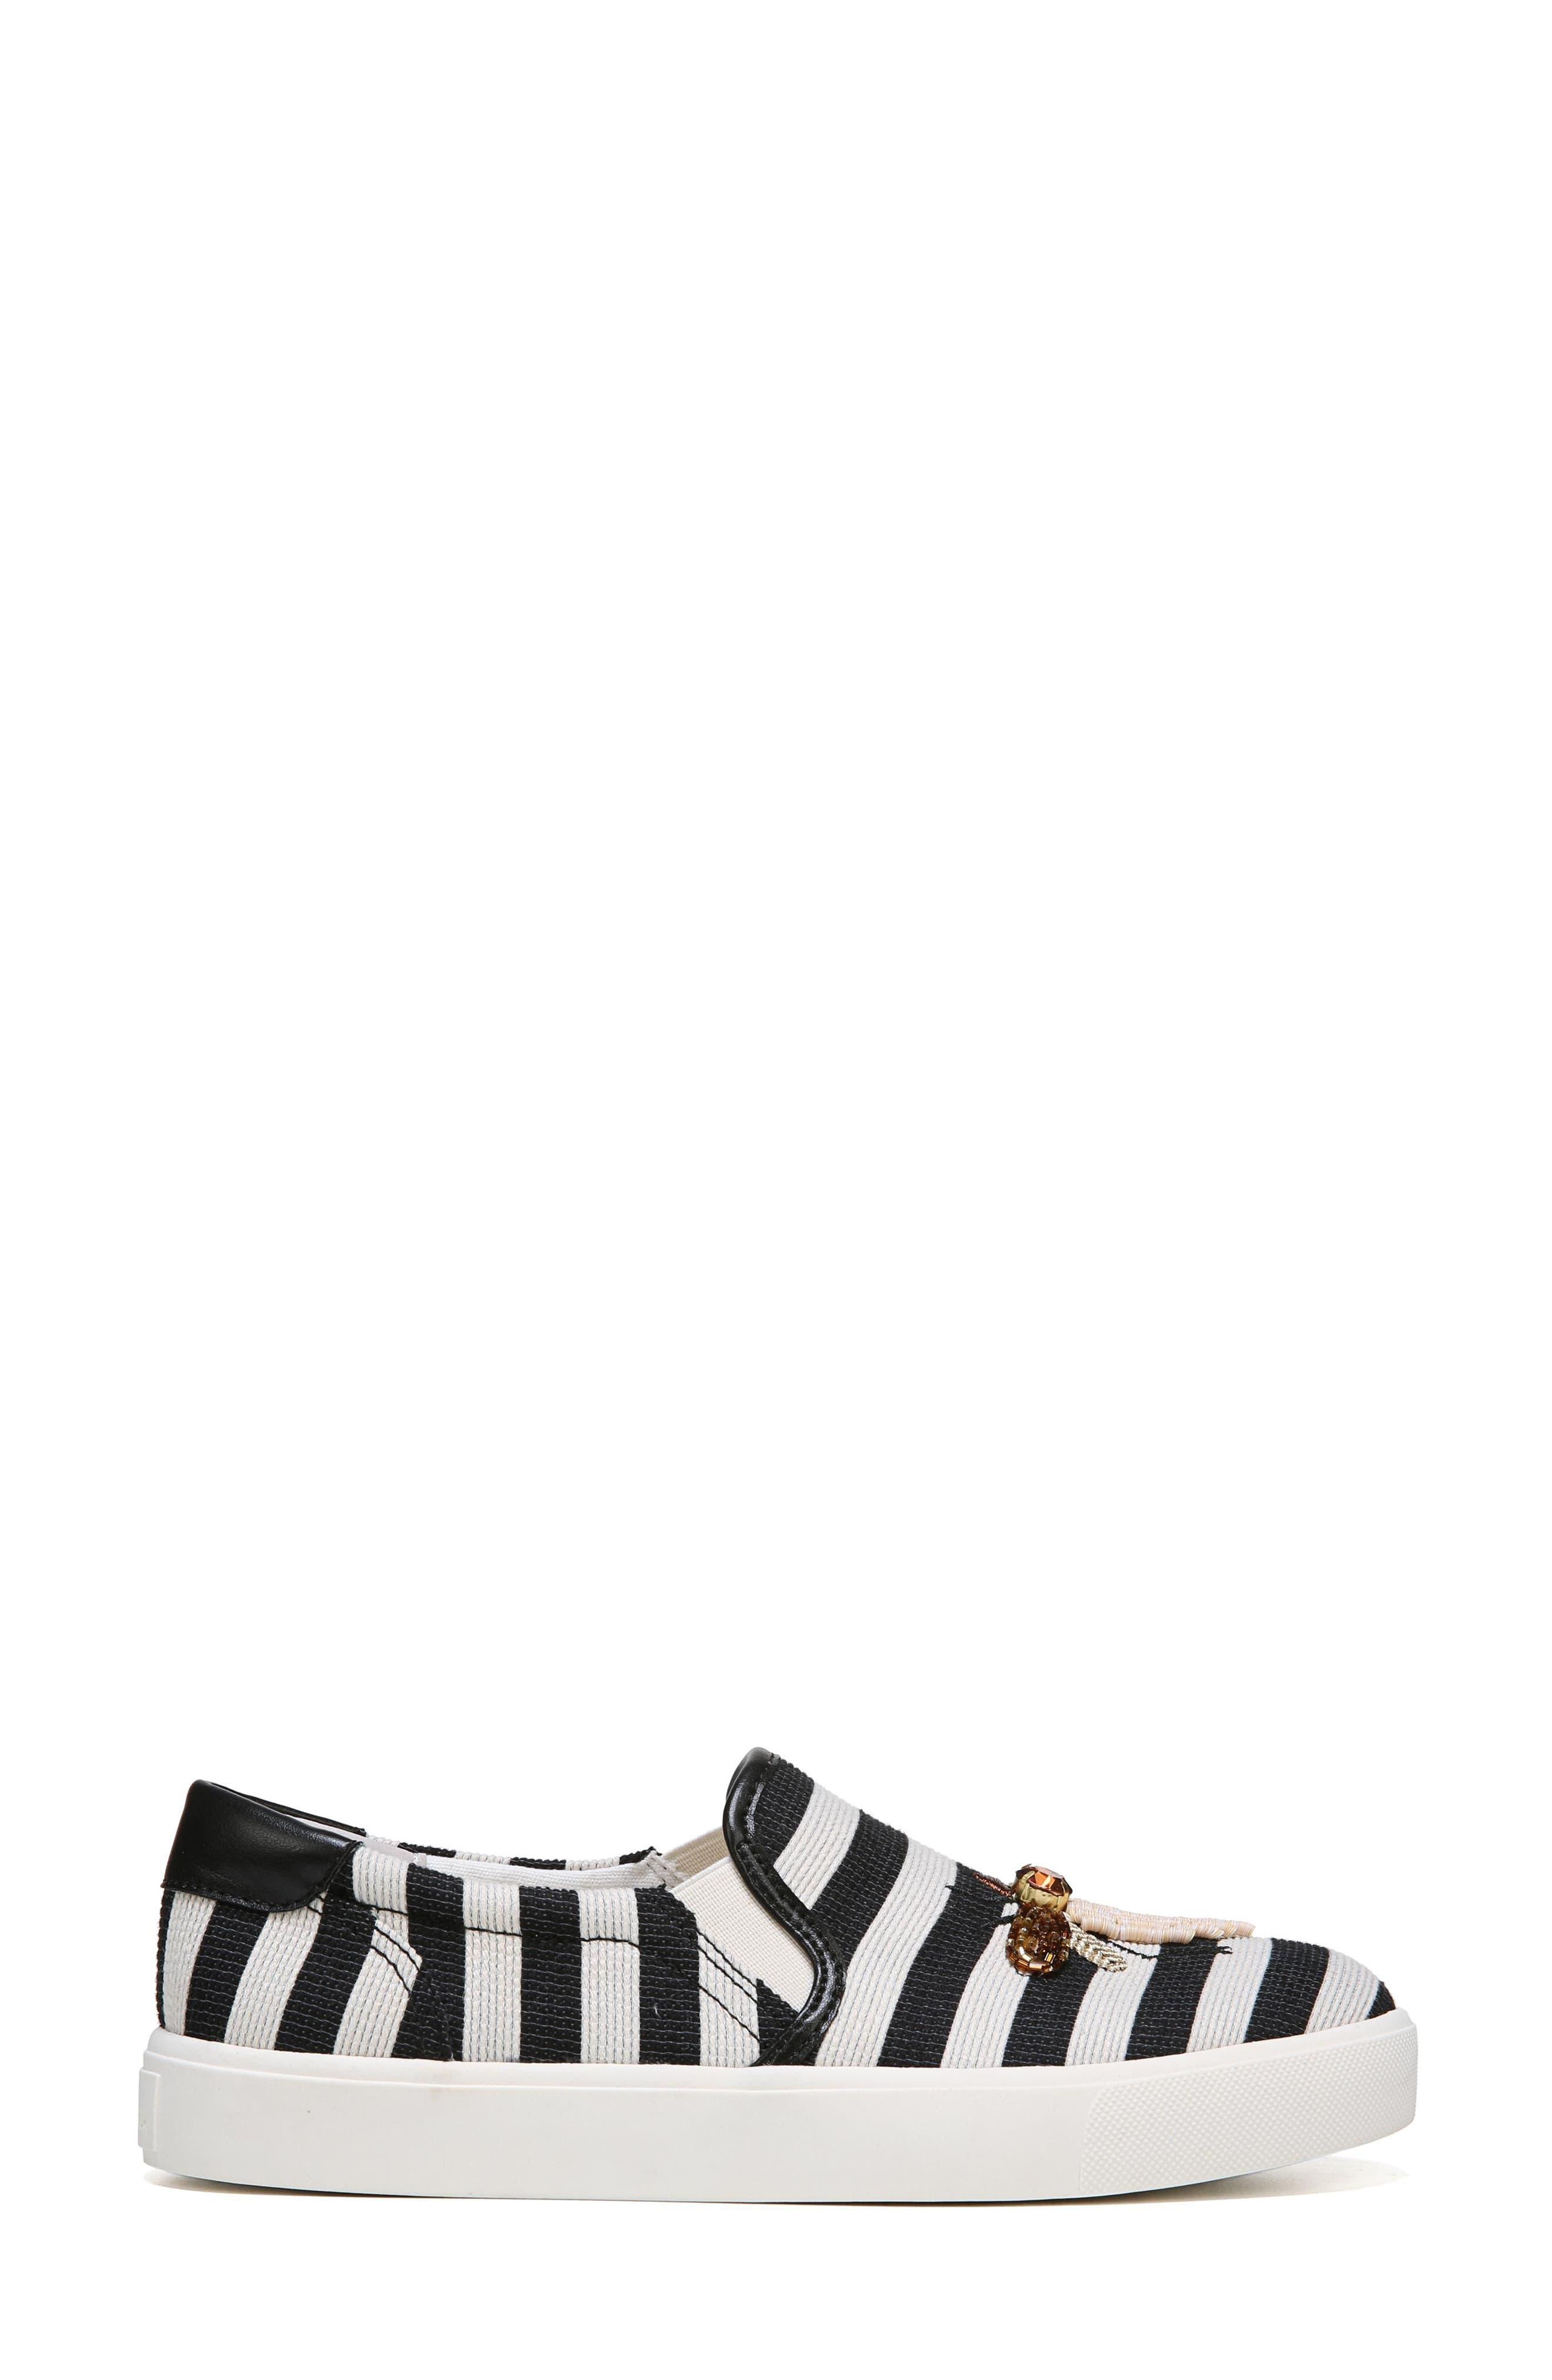 Evelina Slip-On,                             Alternate thumbnail 3, color,                             Black Stripe Nappa Leather